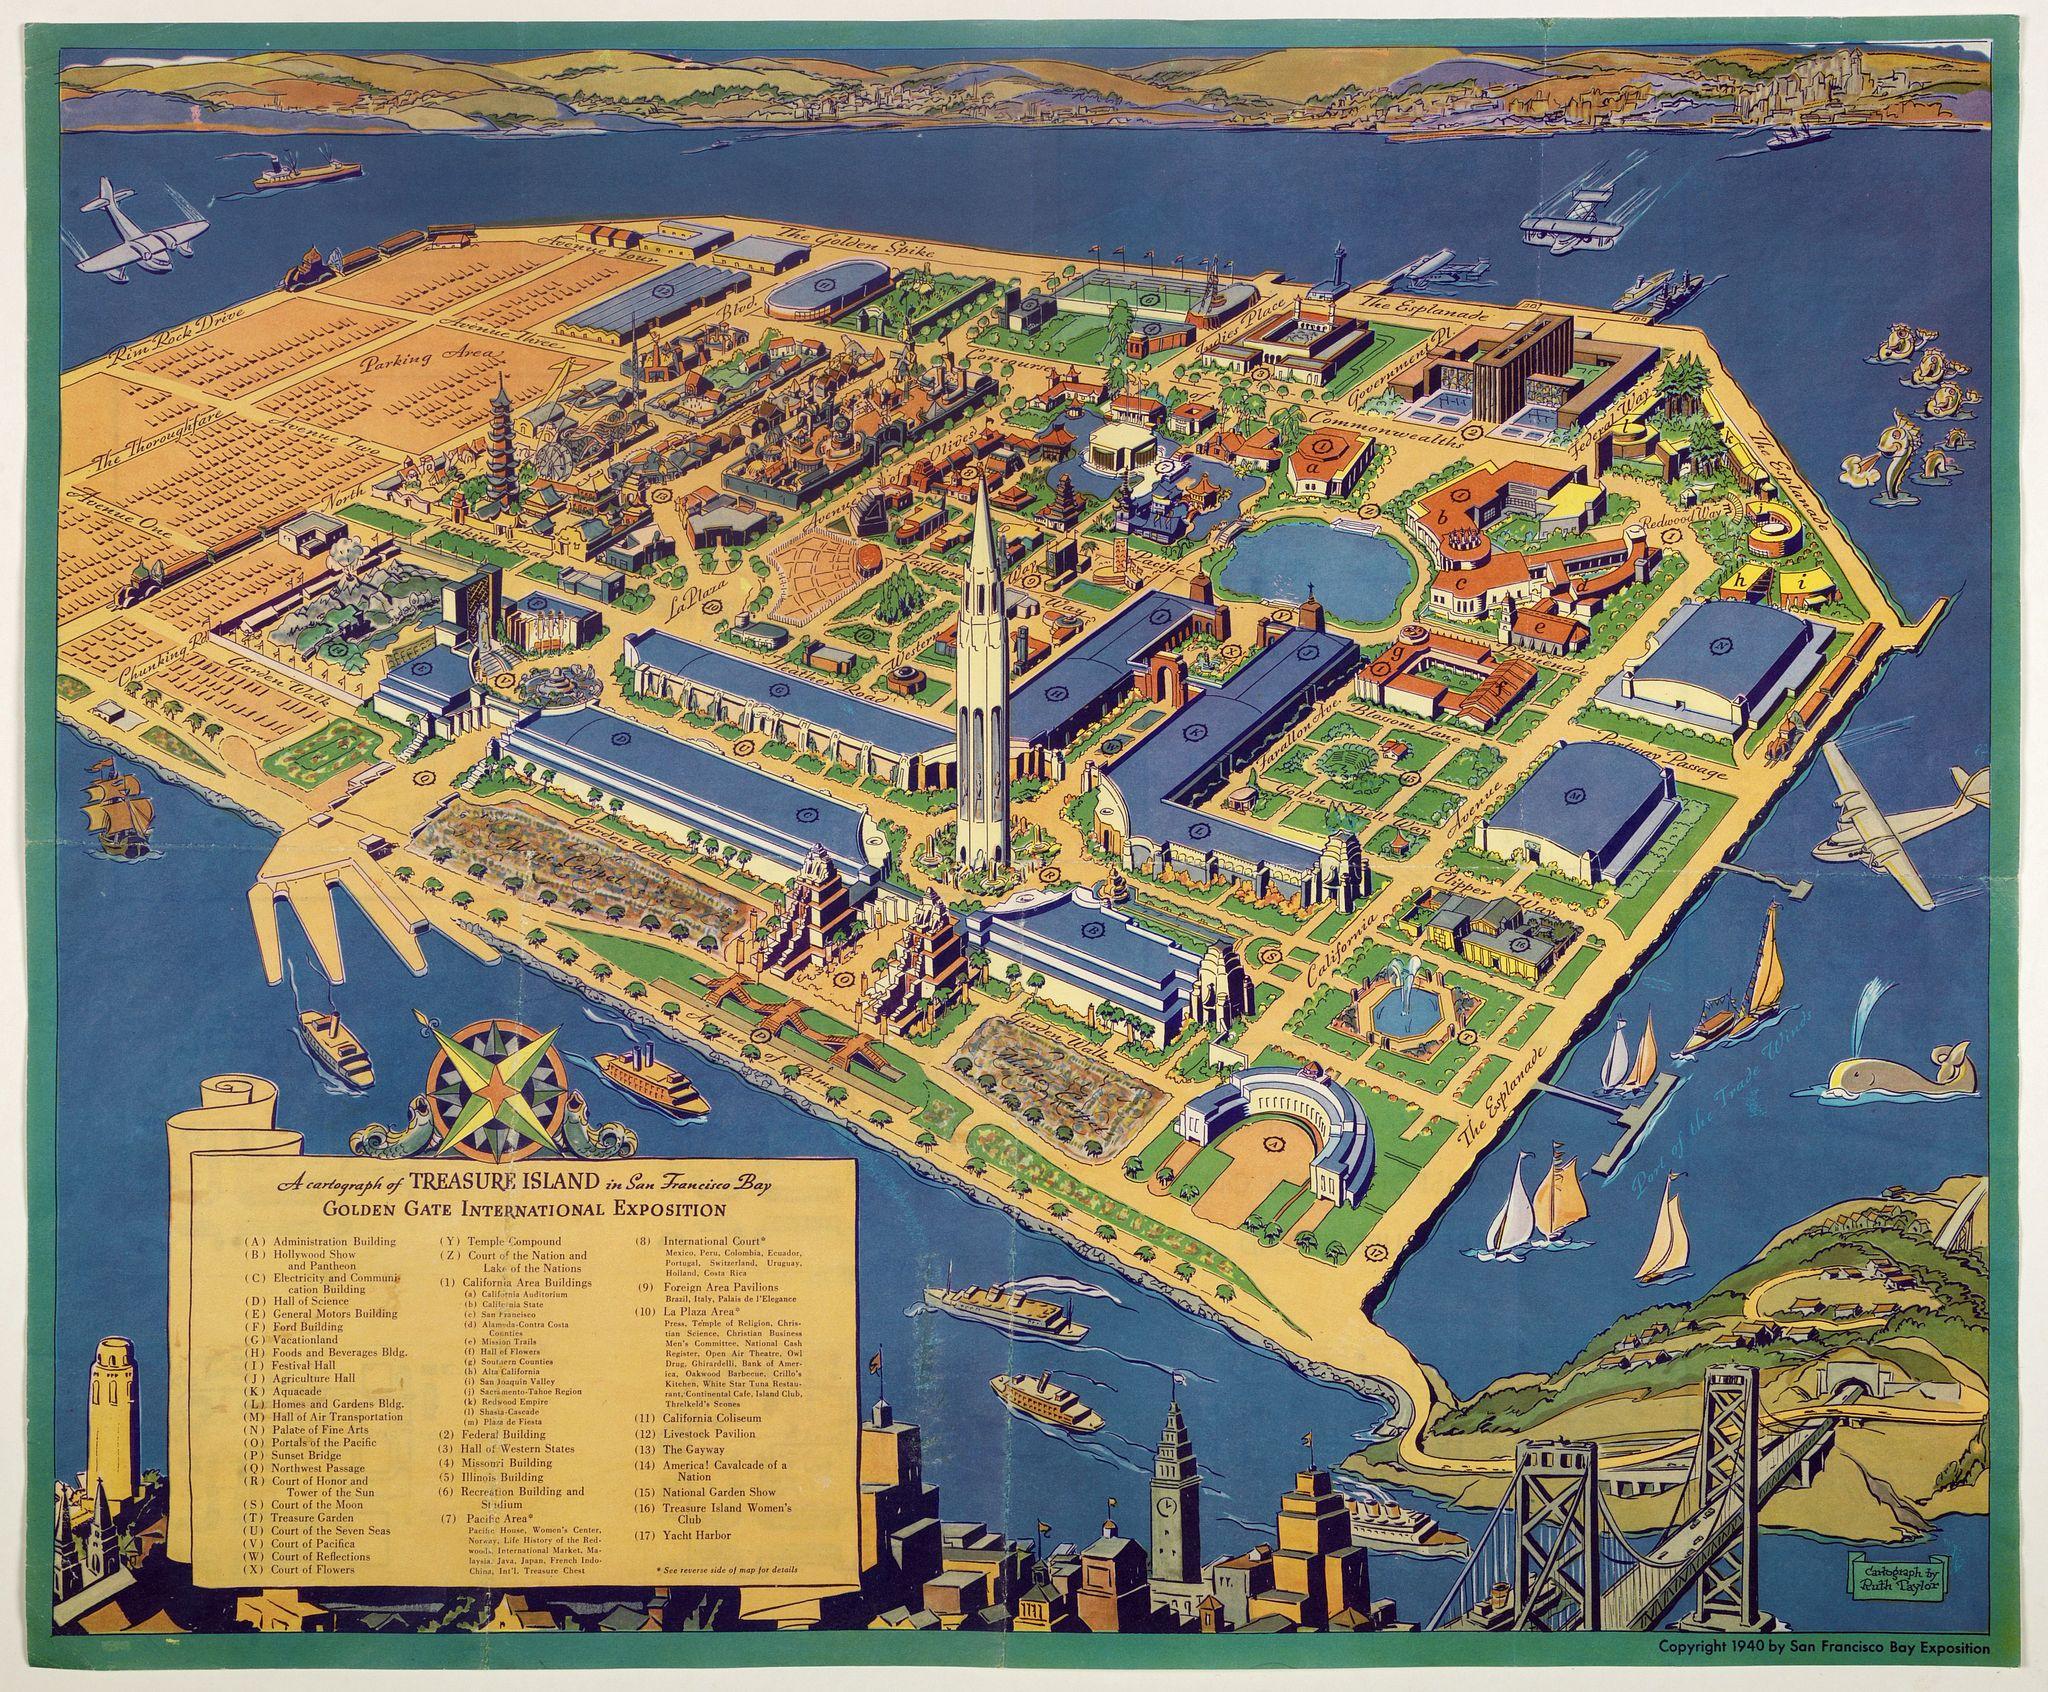 TAYLOR, R. -  A cartograph of Treasure Island in San Francisco Bay Golden Gate International Exposition,